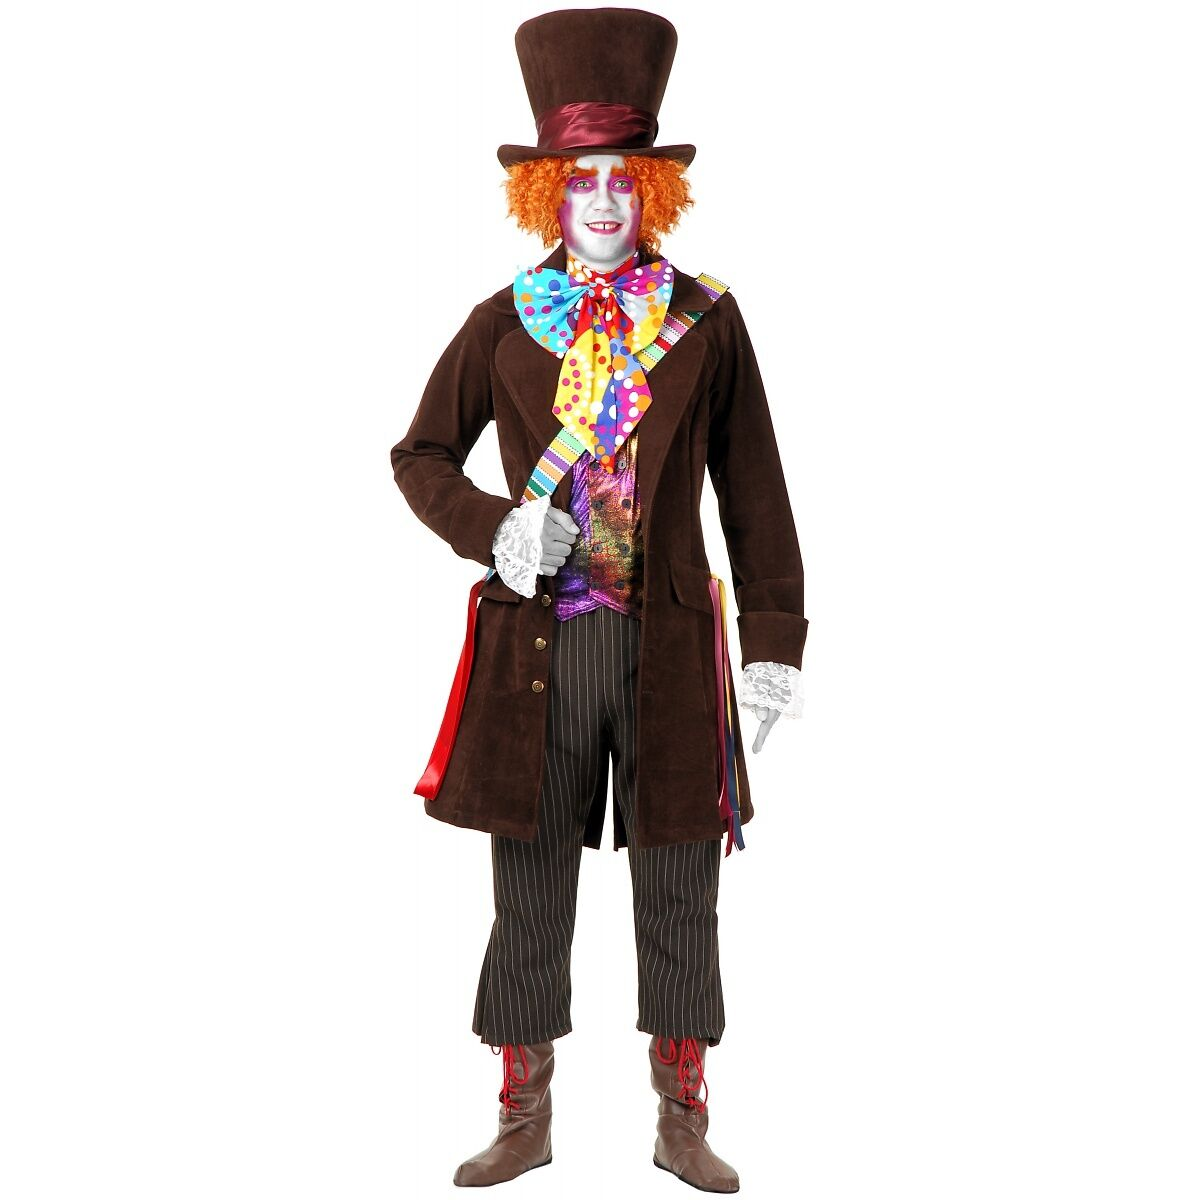 Electric Mad Hatter Adult Alice in Wonderland Halloween Costume